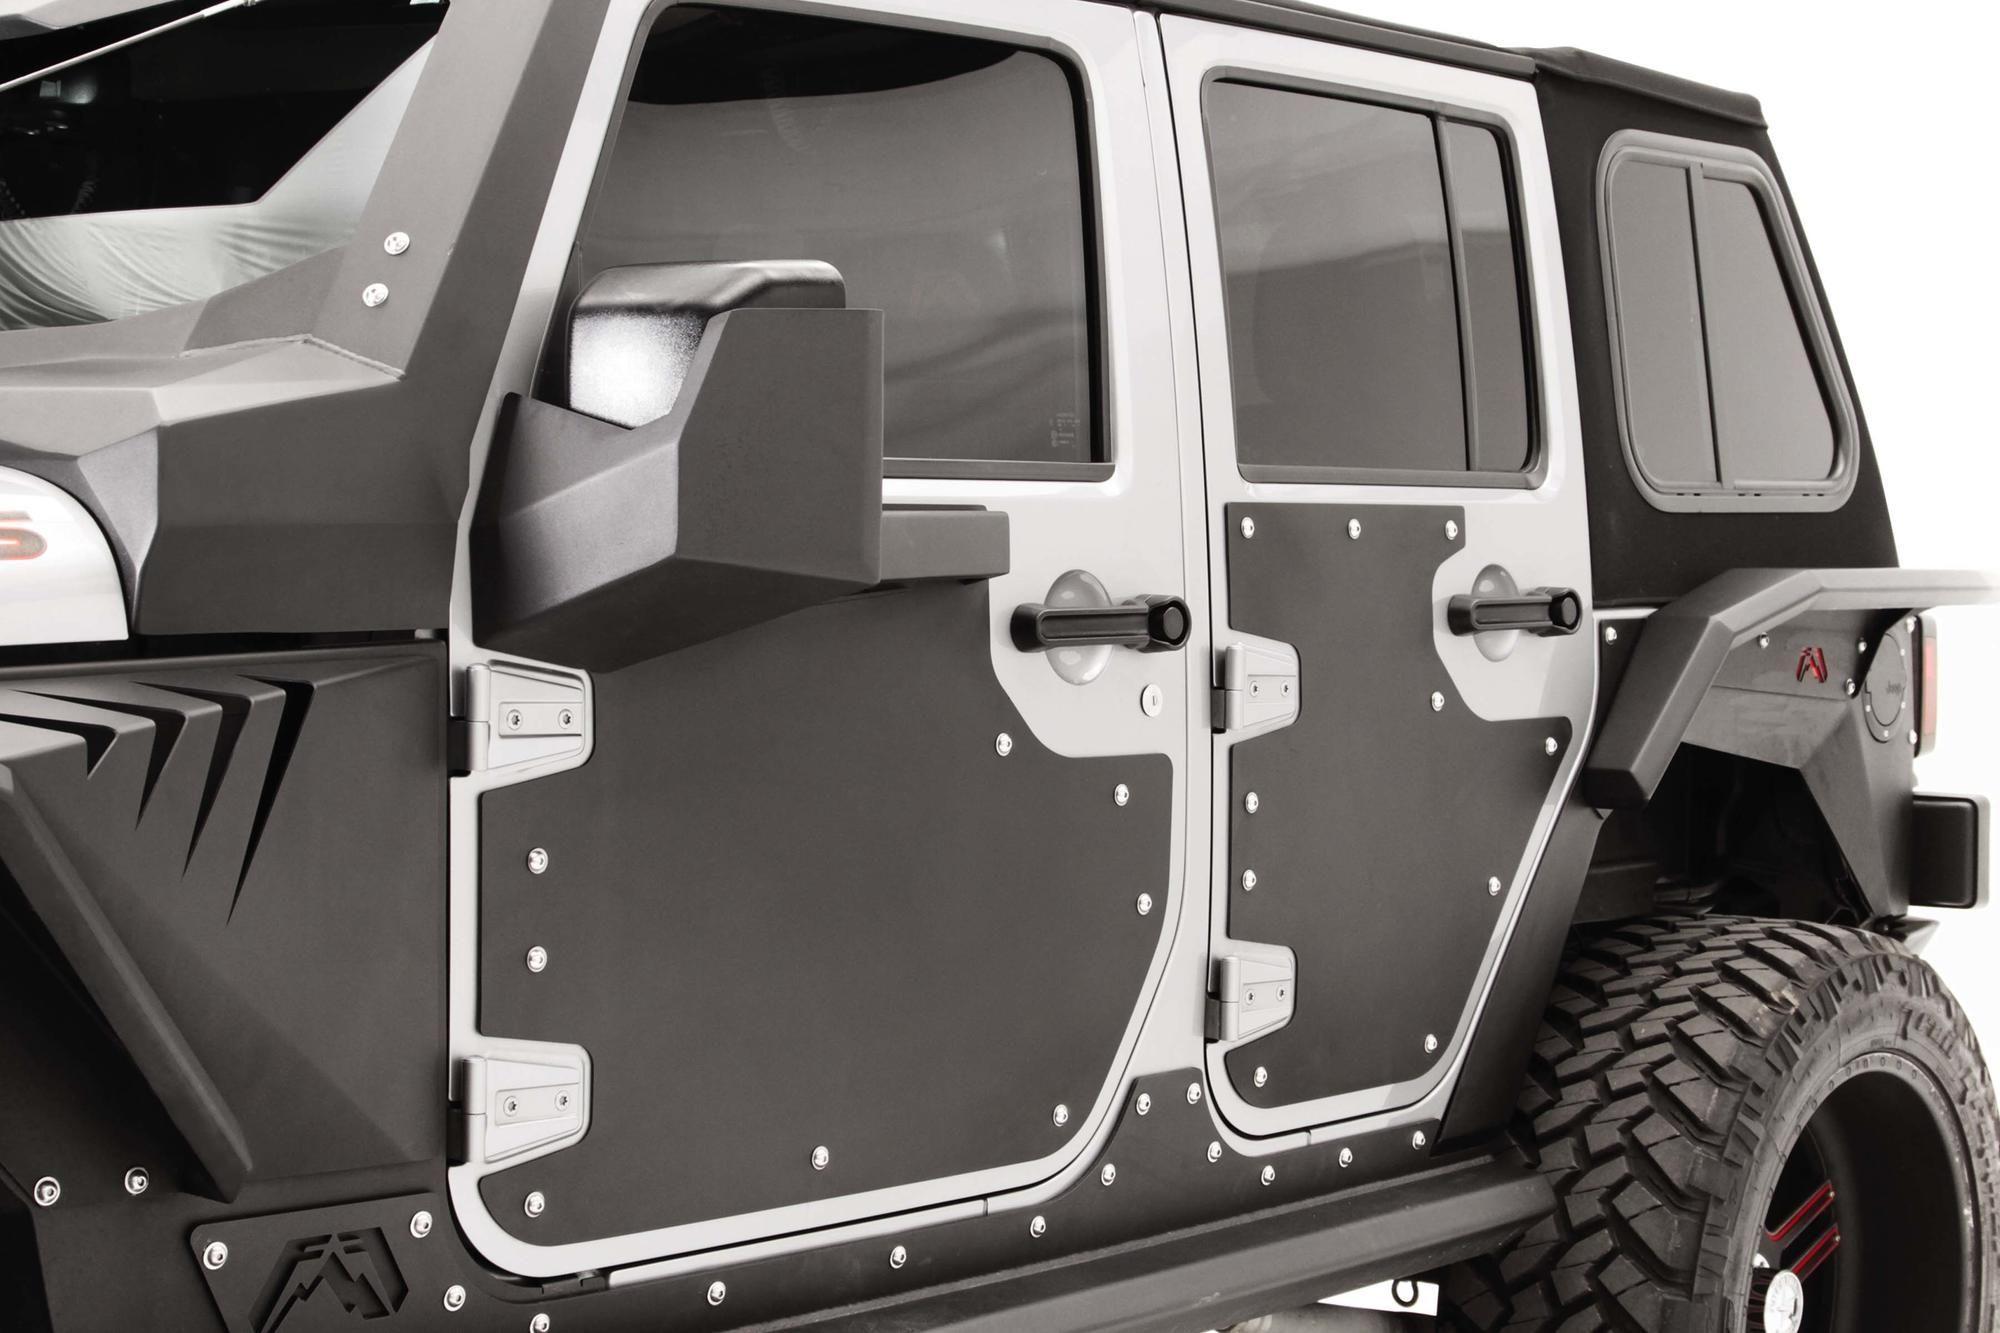 RRC,07-16 Jeep Wrangler JKU Rugged Ridge 11504.25 Side Armor Guard Plate